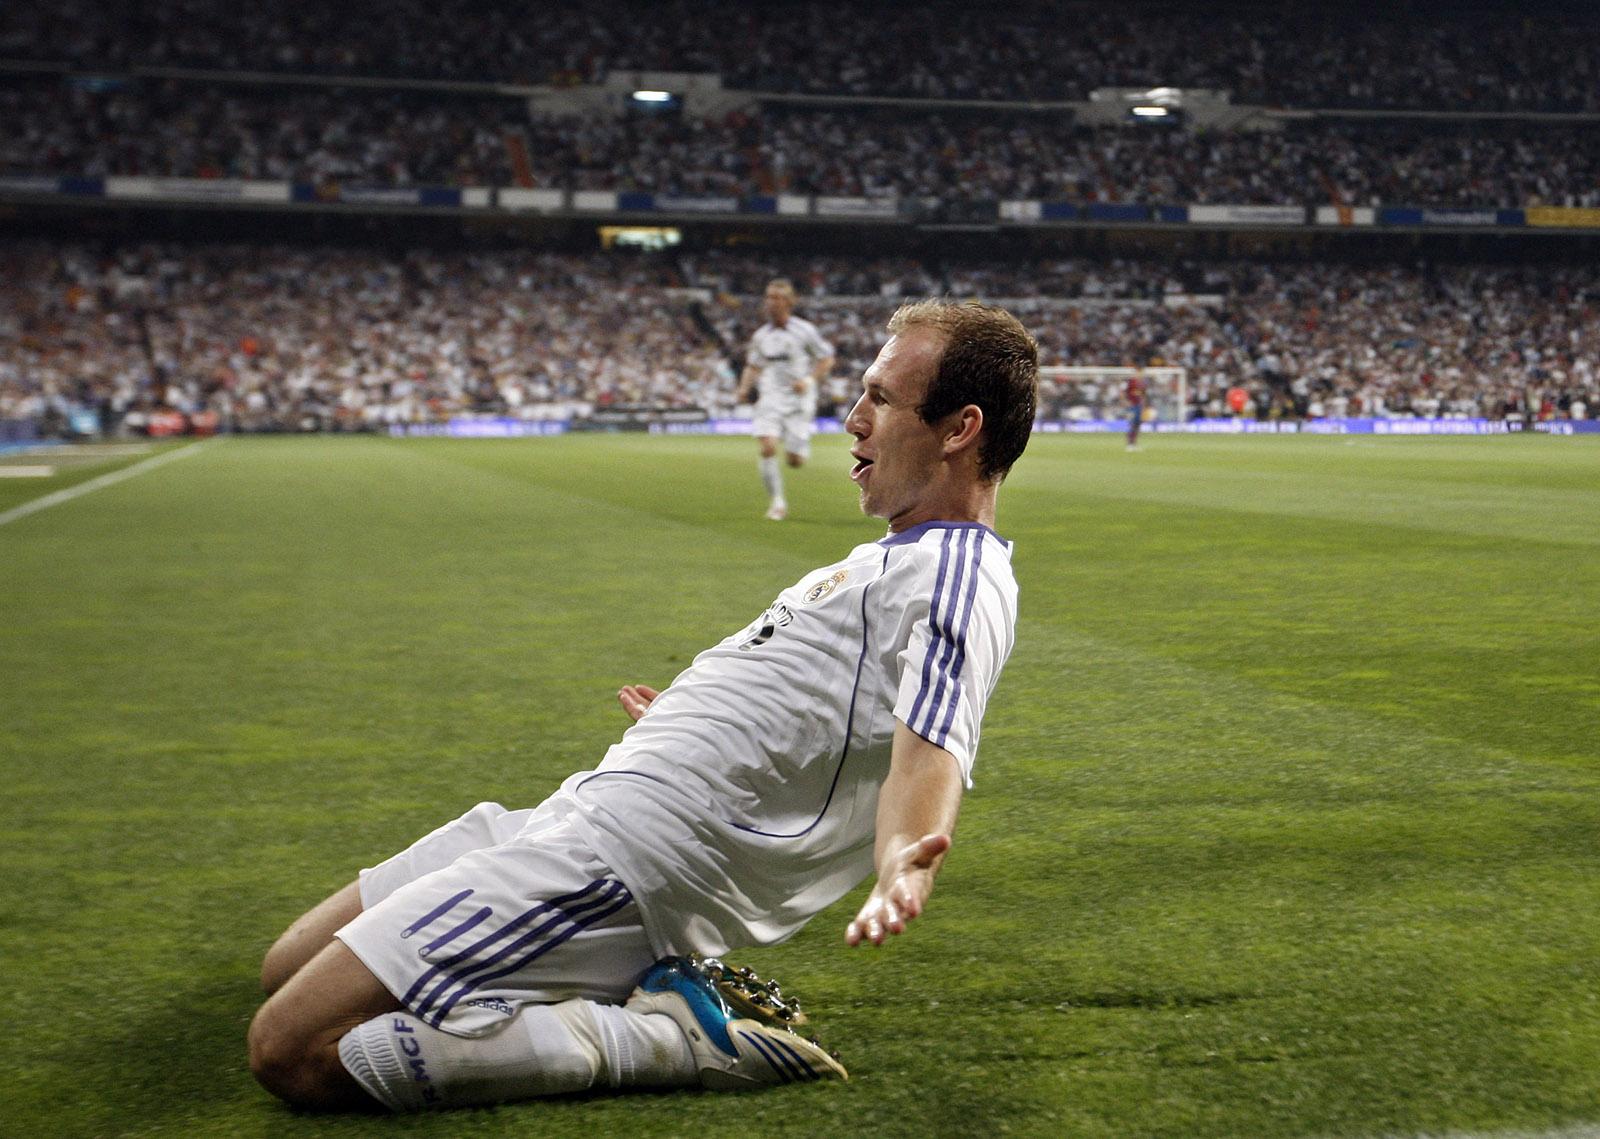 foto: Jasper Juinen | Arjen Robben, recente westrijd Real Madrid - Barcelona